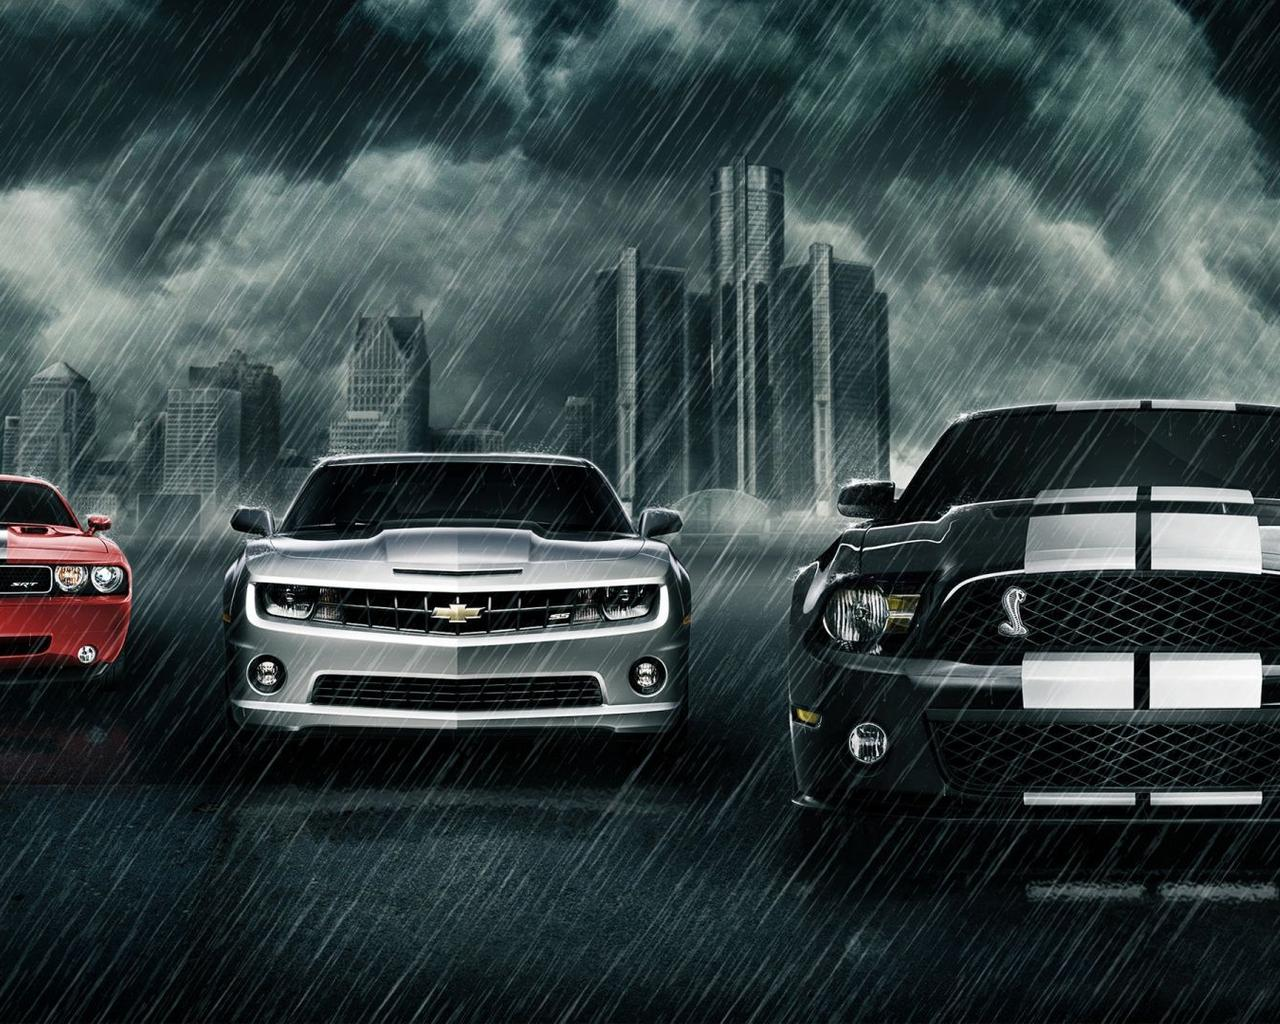 Three Wonderful Cars In The Rain Creative Wallpaper